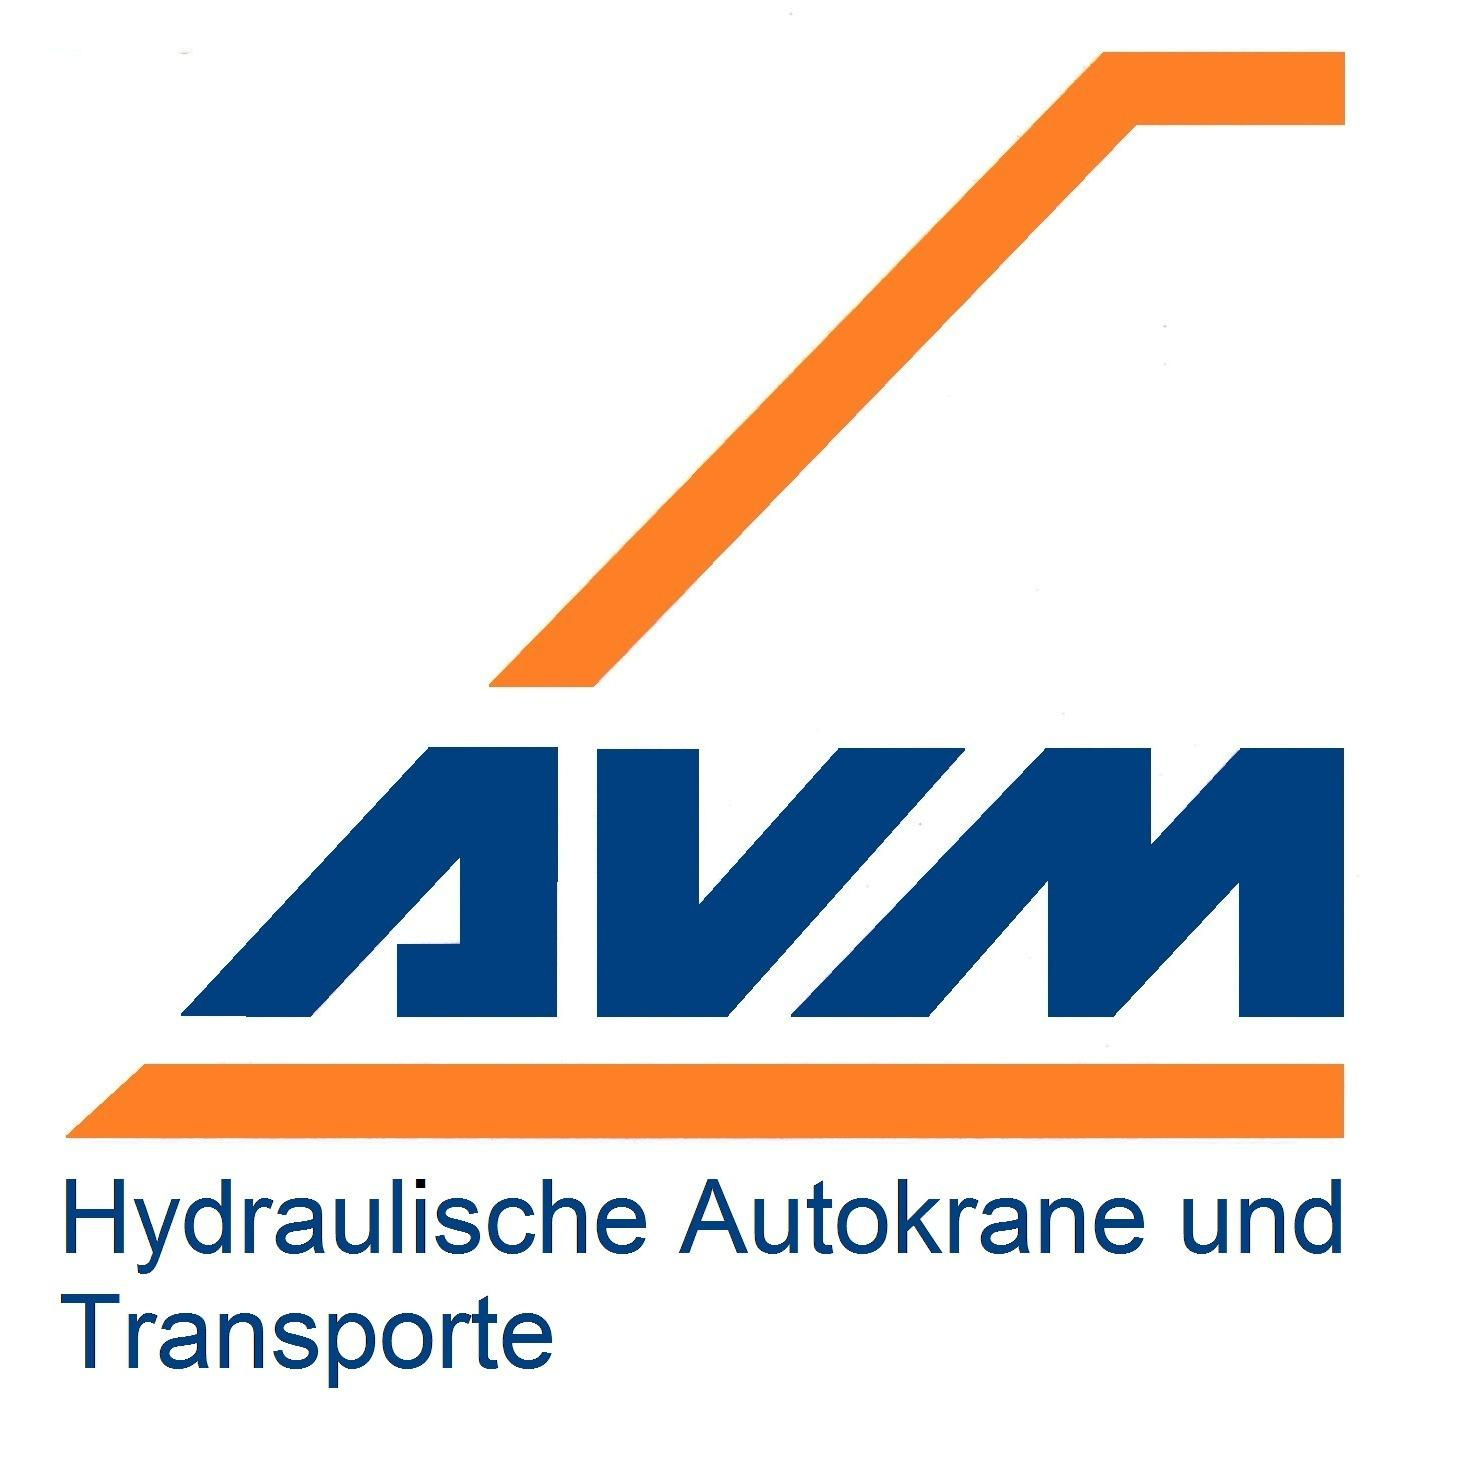 Autokran-Vermietung GmbH & Co. KG